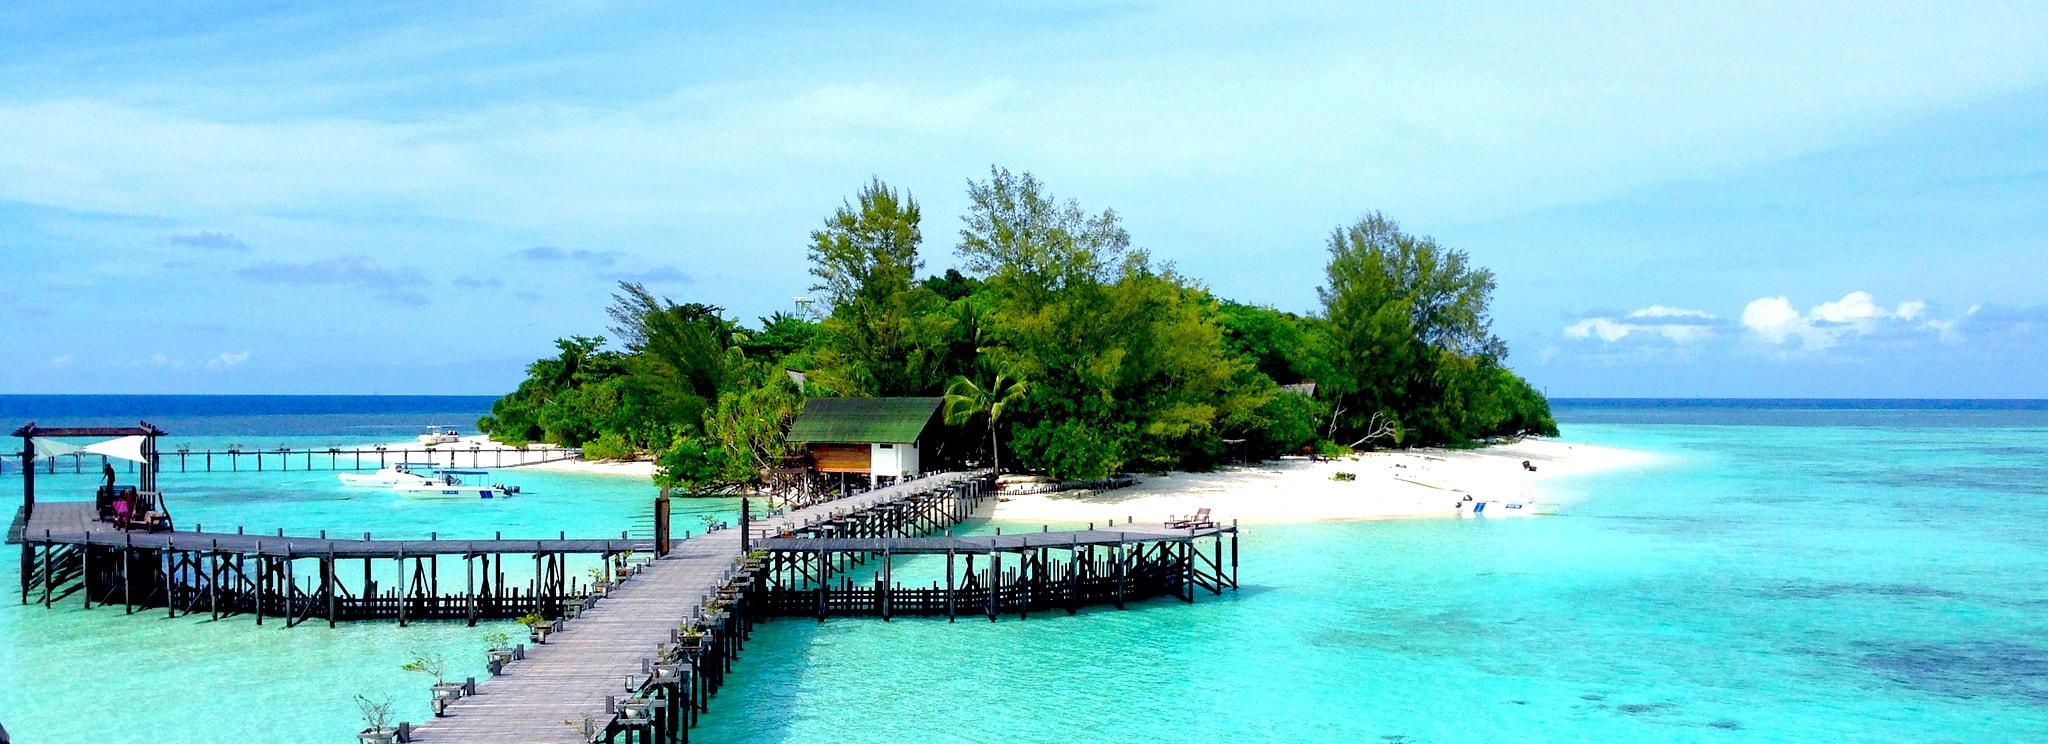 Lankayan Island Dive Resort 3D2N